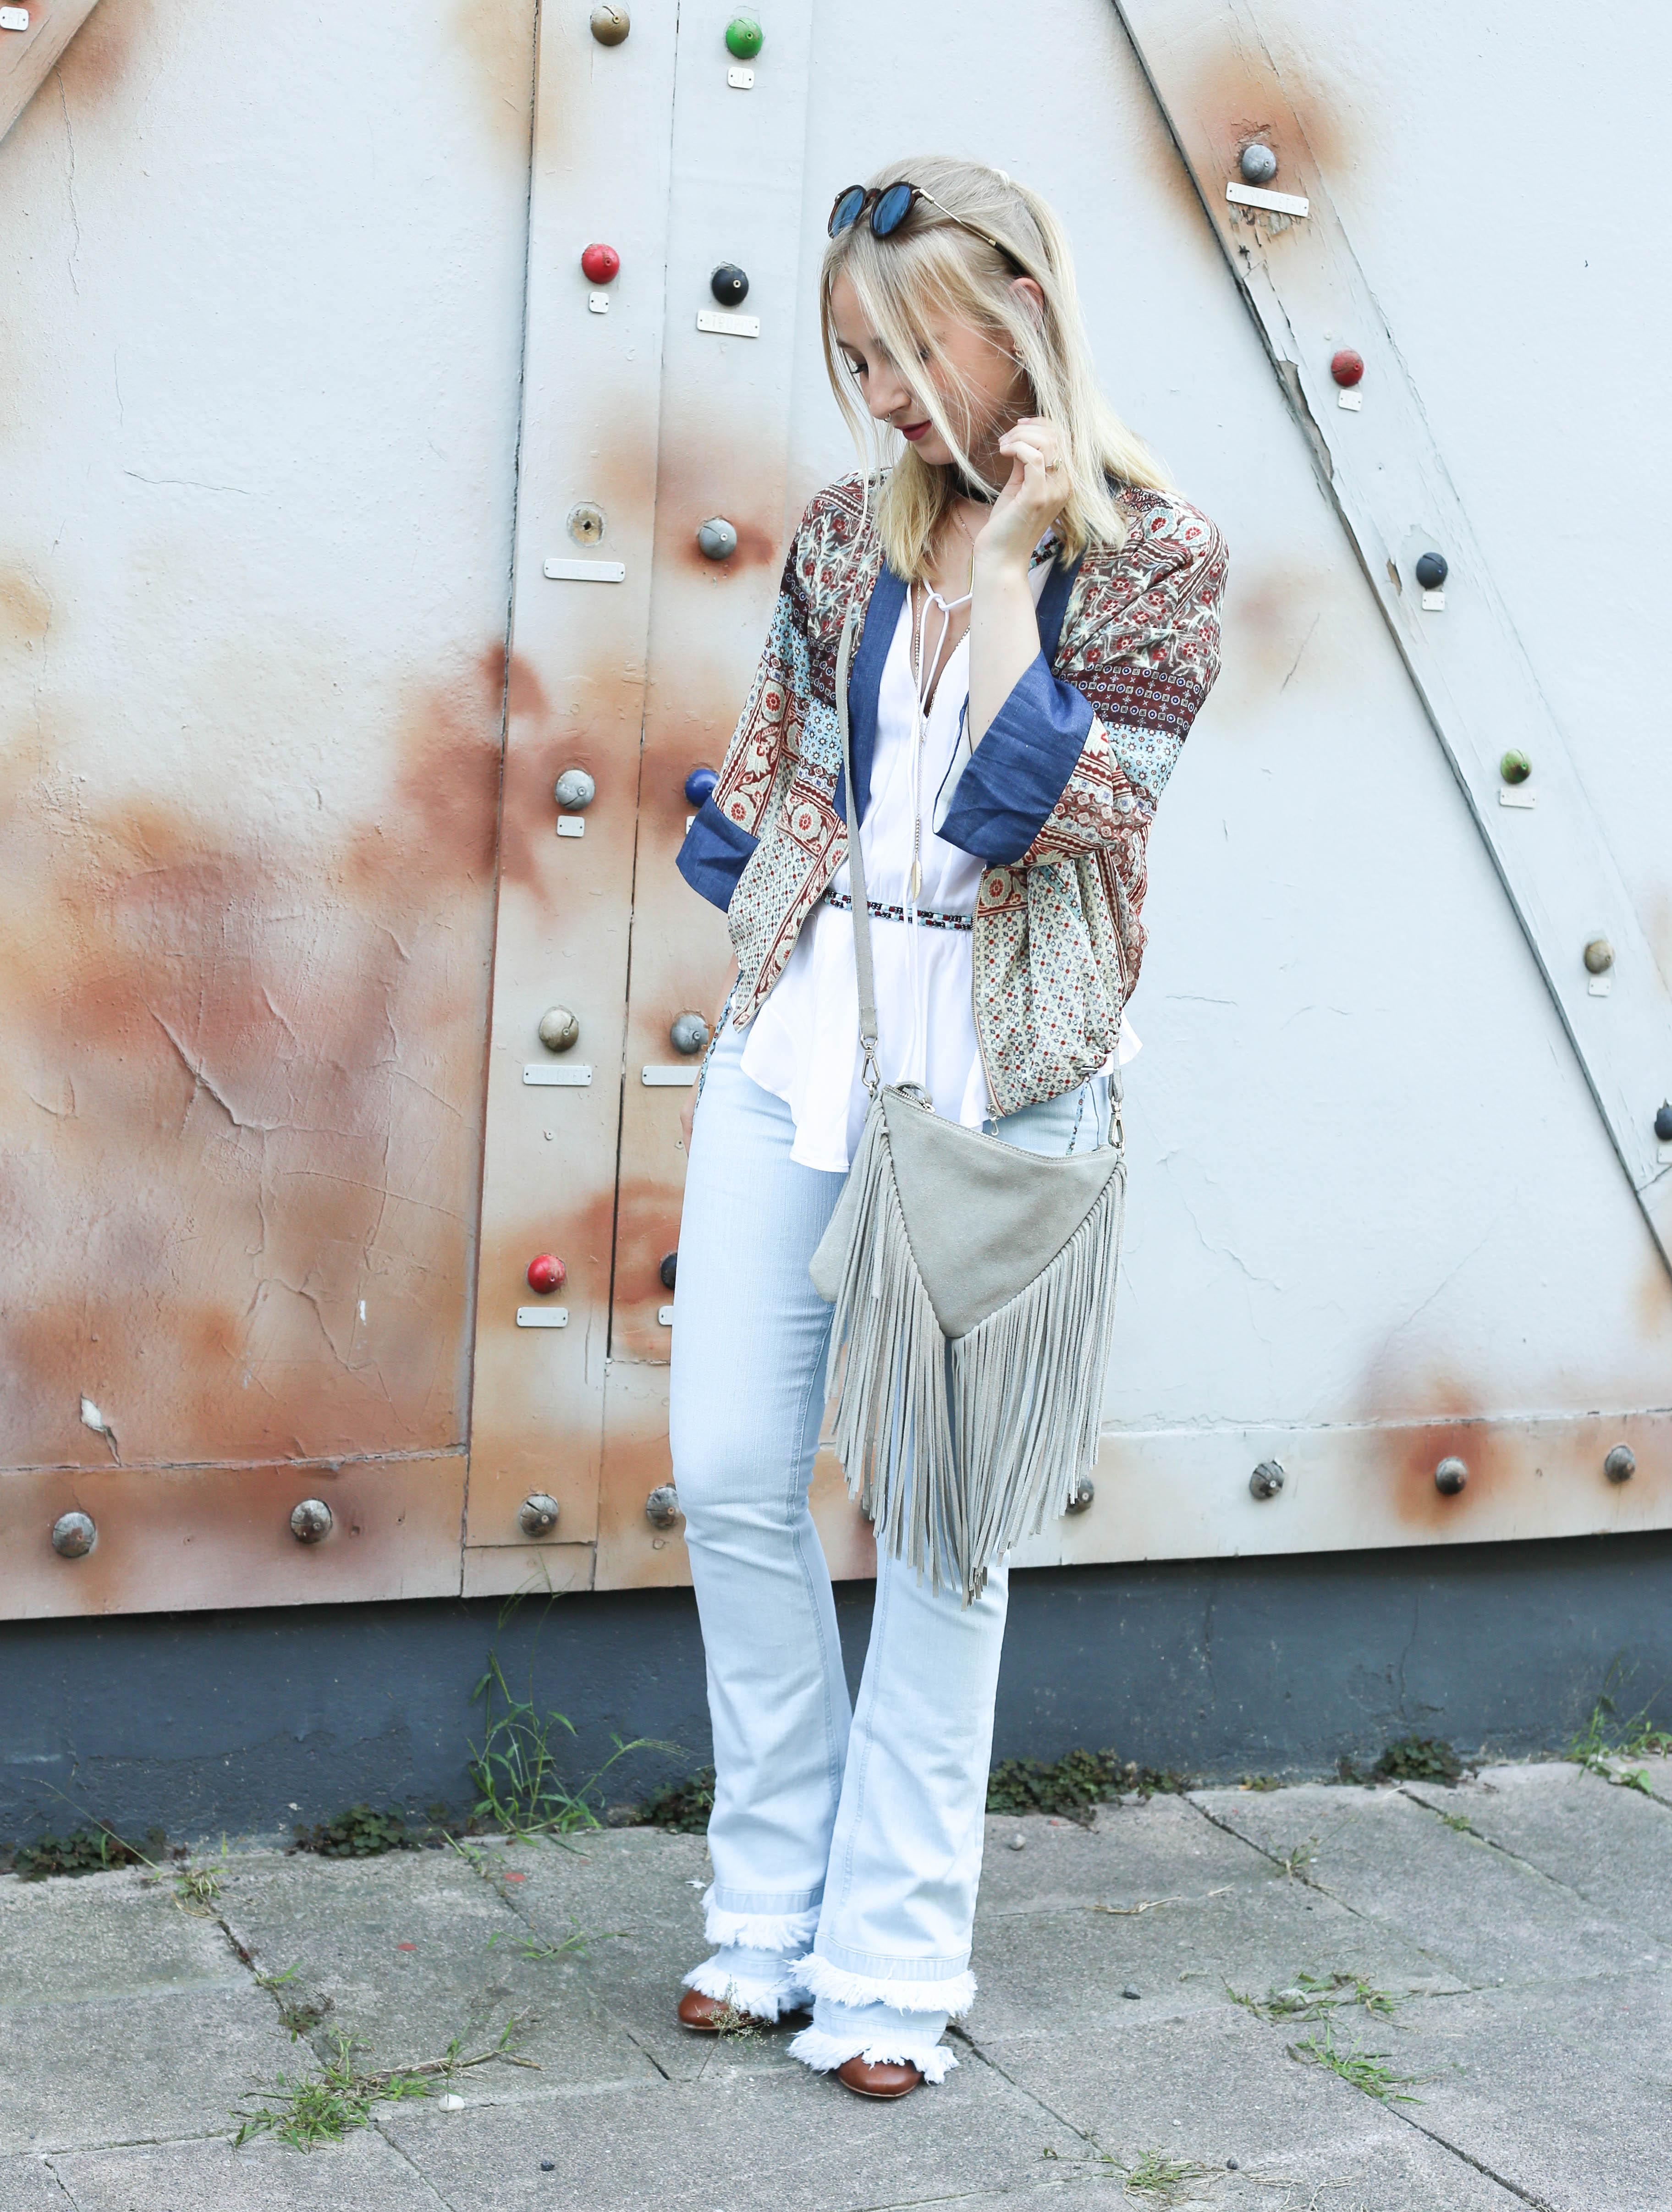 festival-look-fashionblog-berlin-modeblog-outfit-schlaghose-flared-jeans_1639